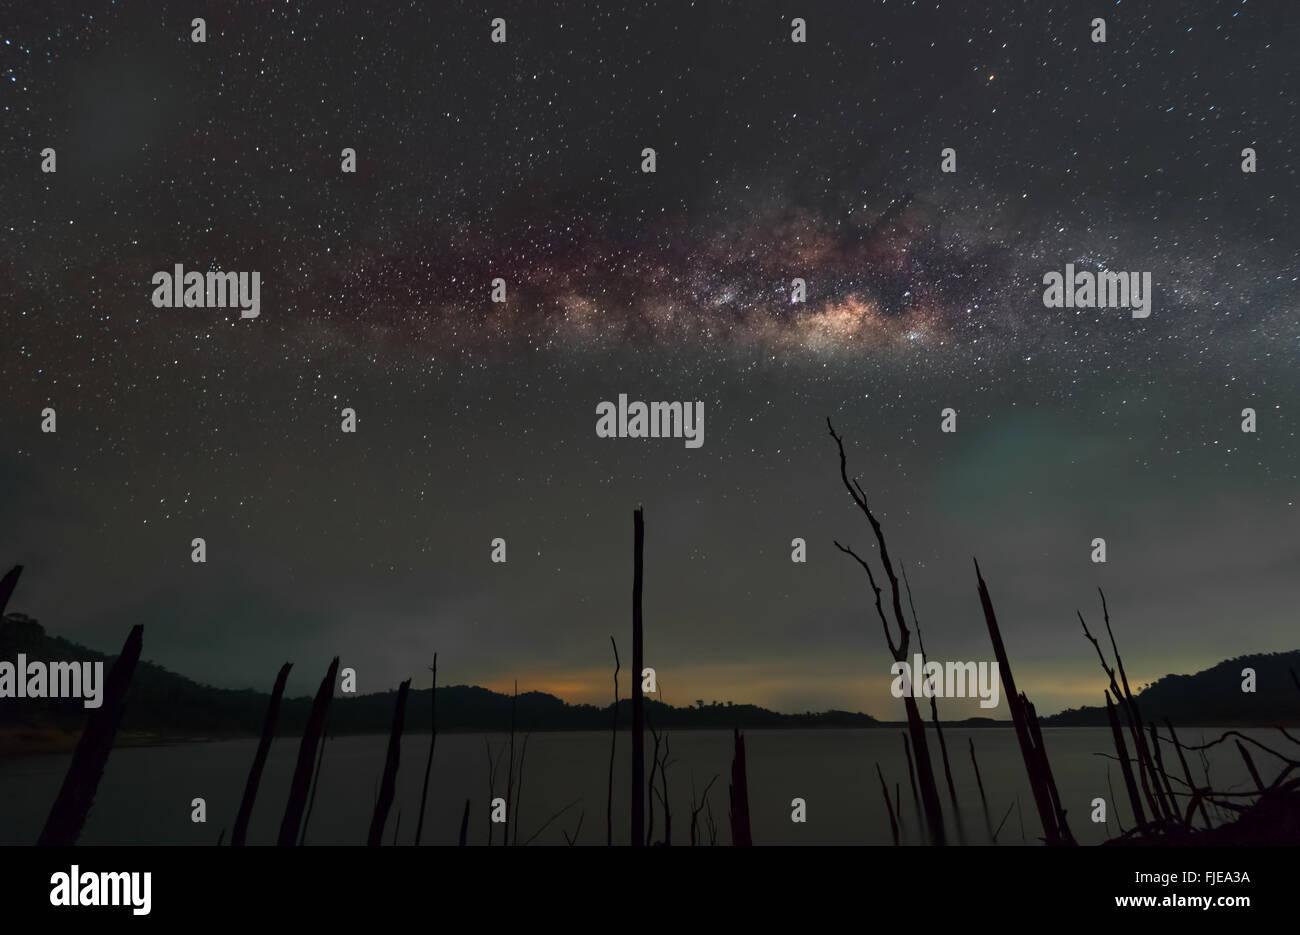 Milky way landscape - Stock Image